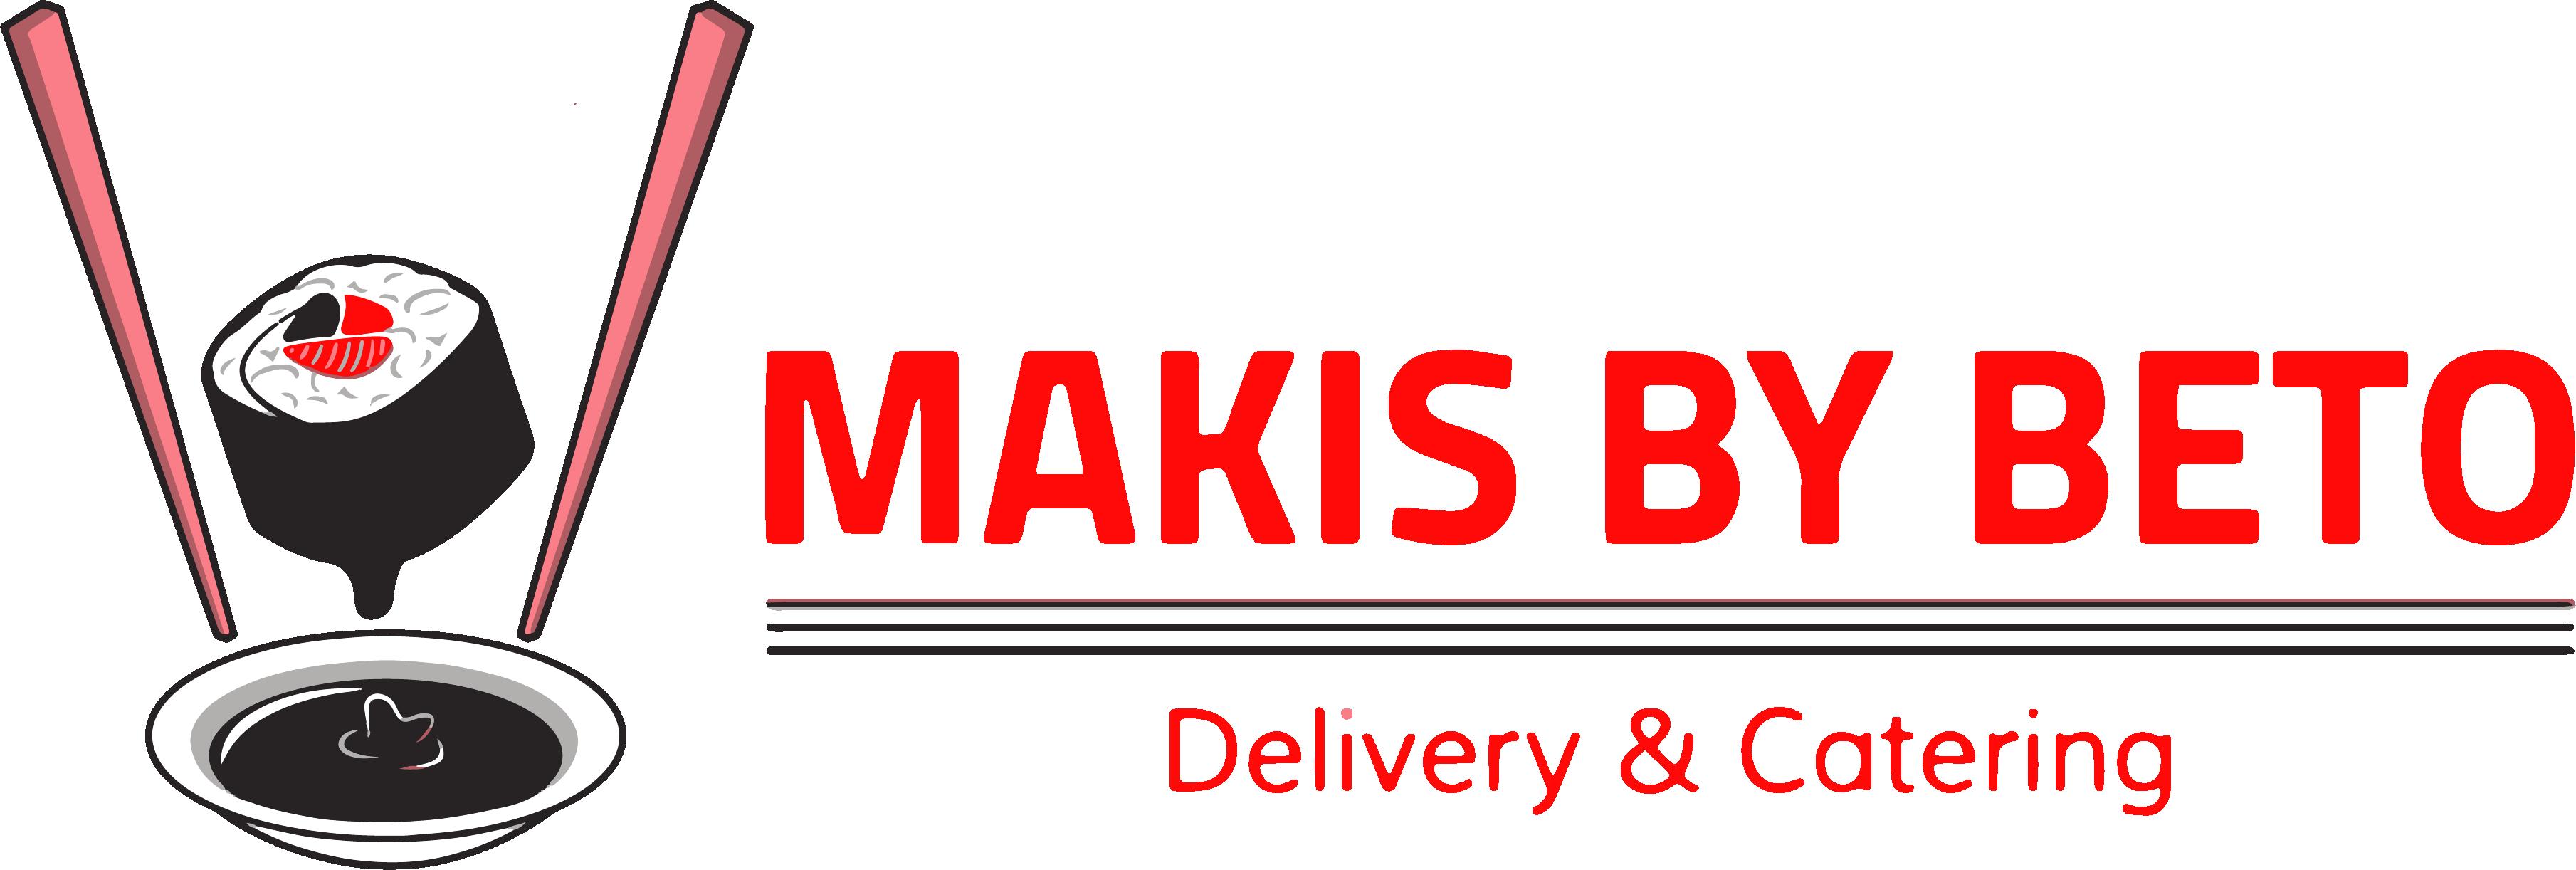 Makis By Beto